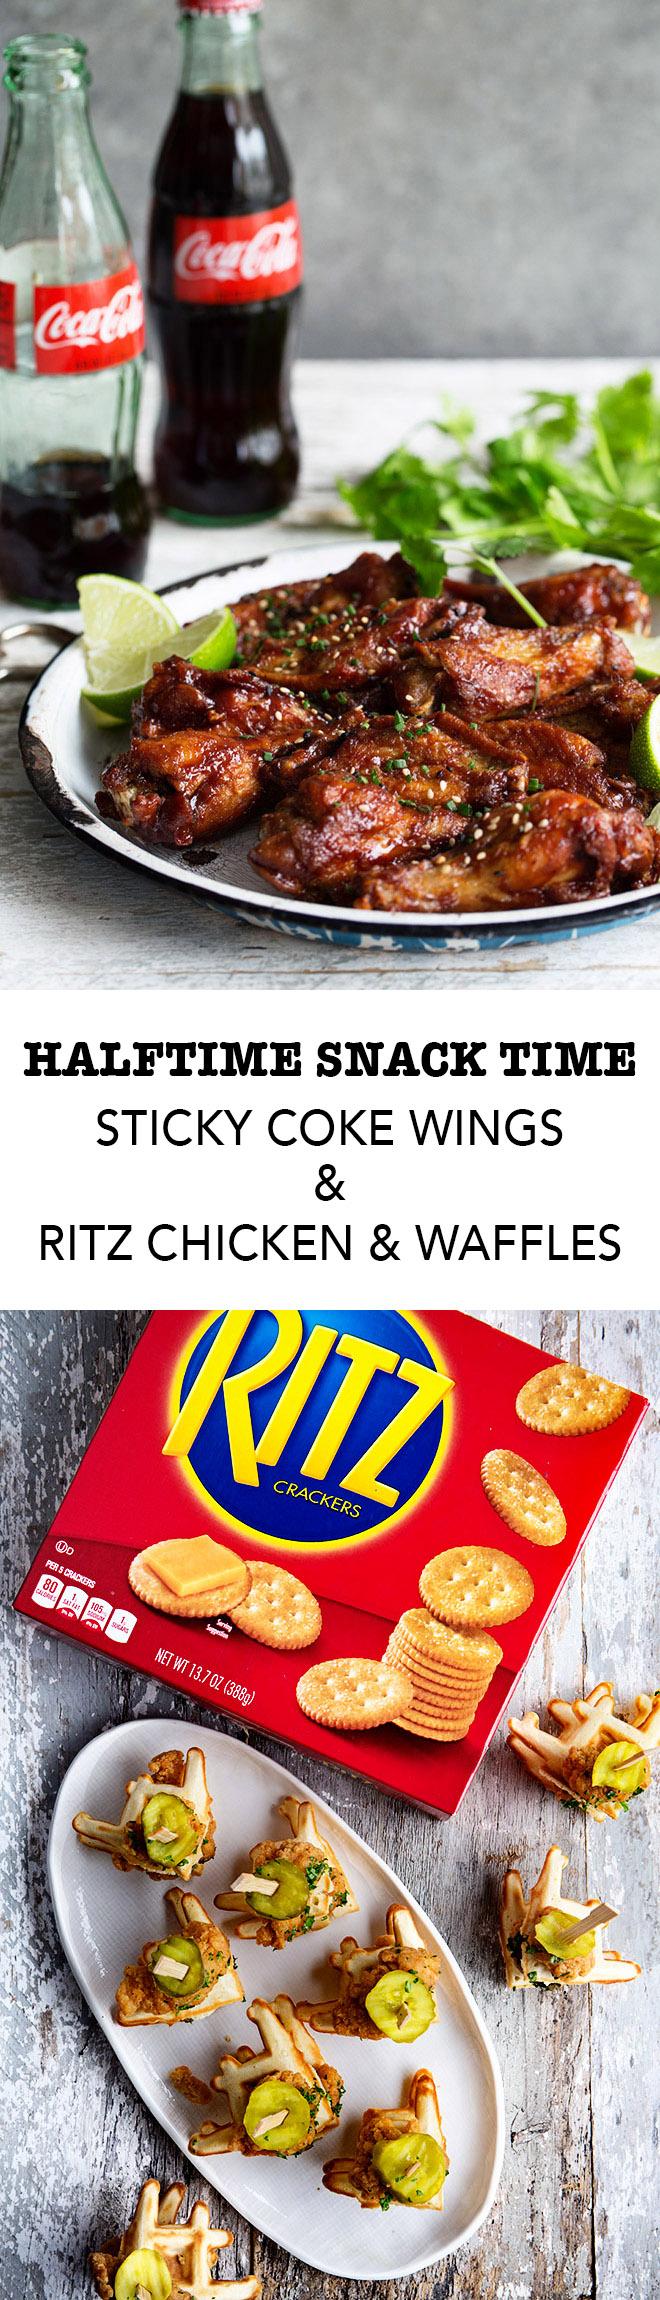 Half Time Snack Time